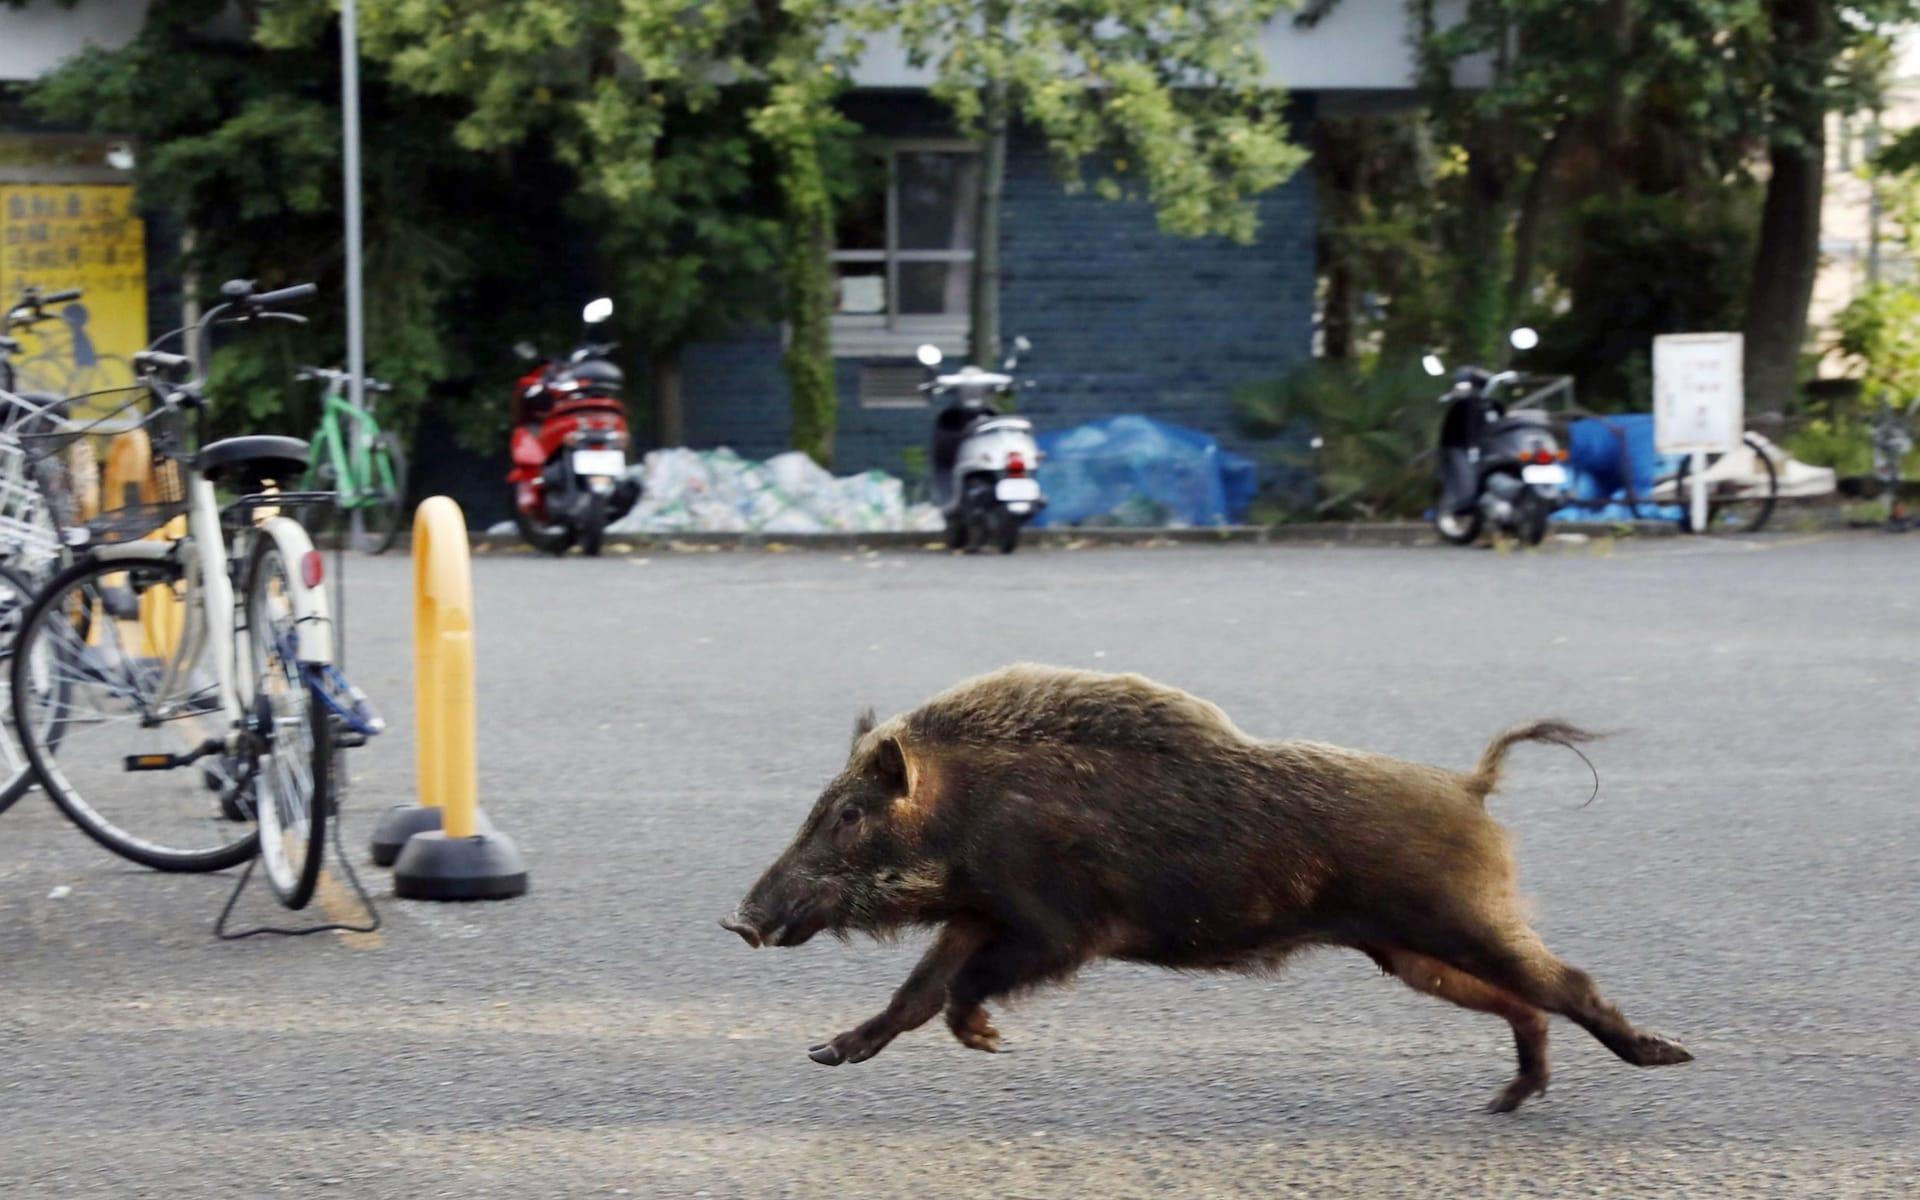 wild_boar_running_in_Kioto